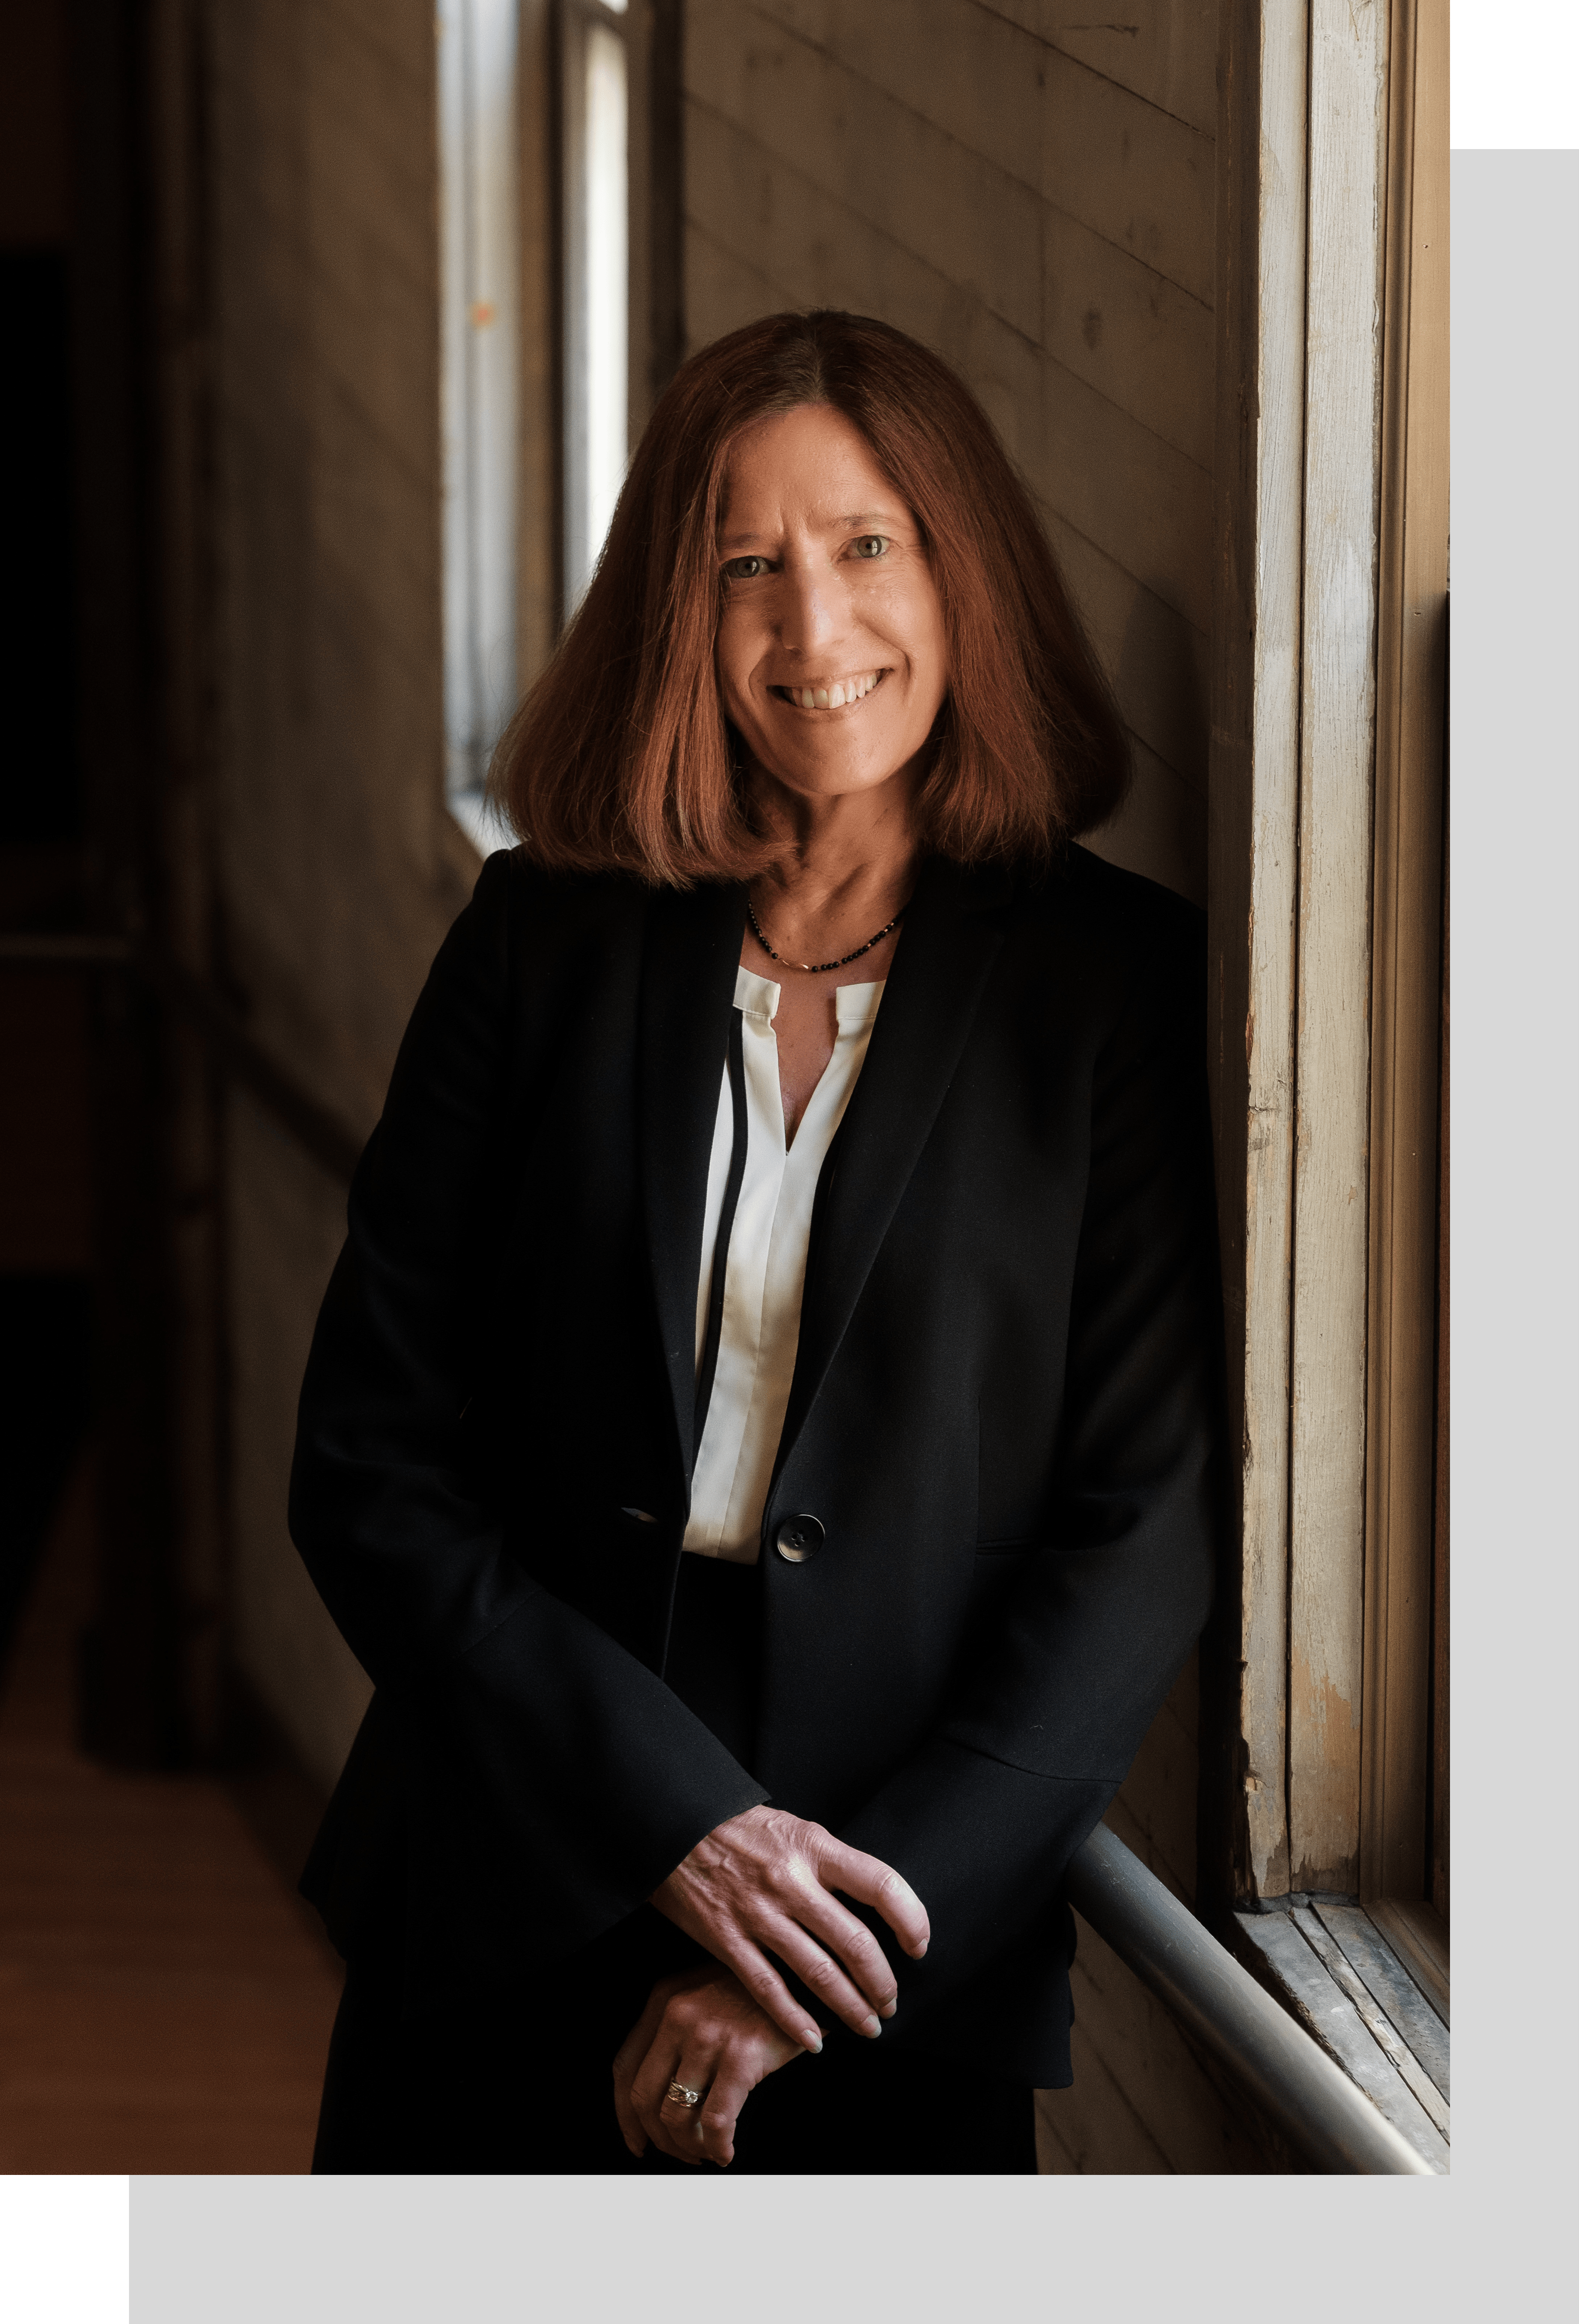 Attorney Catherine La Fleur